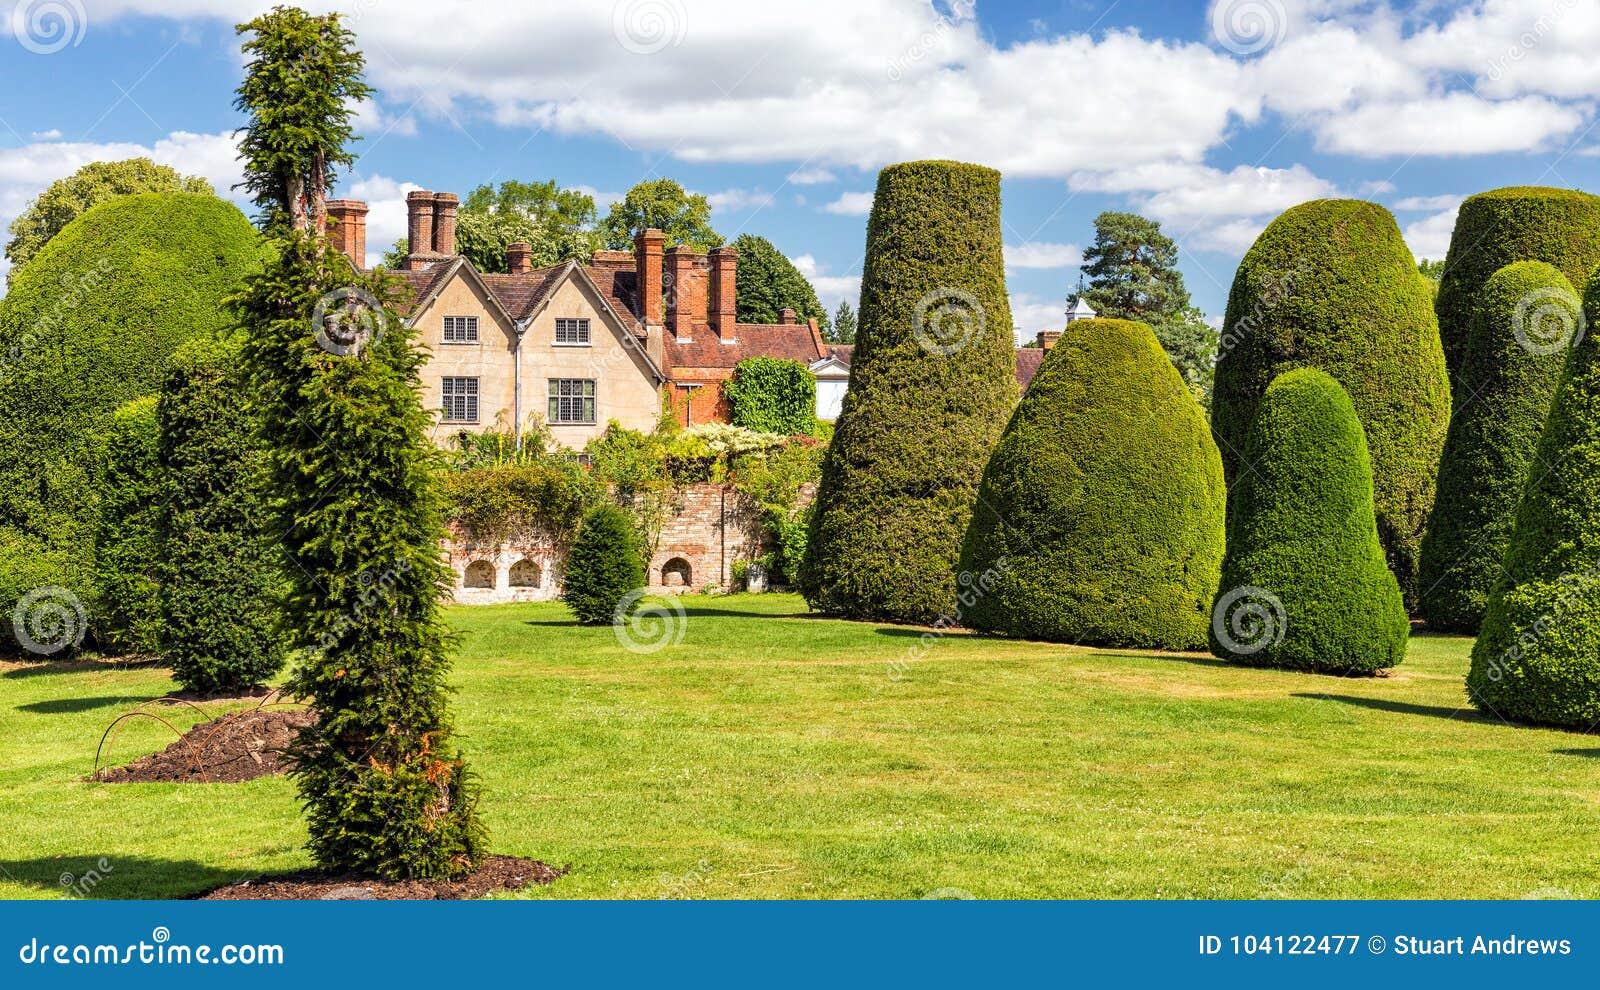 The Yew Garden, Packwood House, Warwickshire, England.